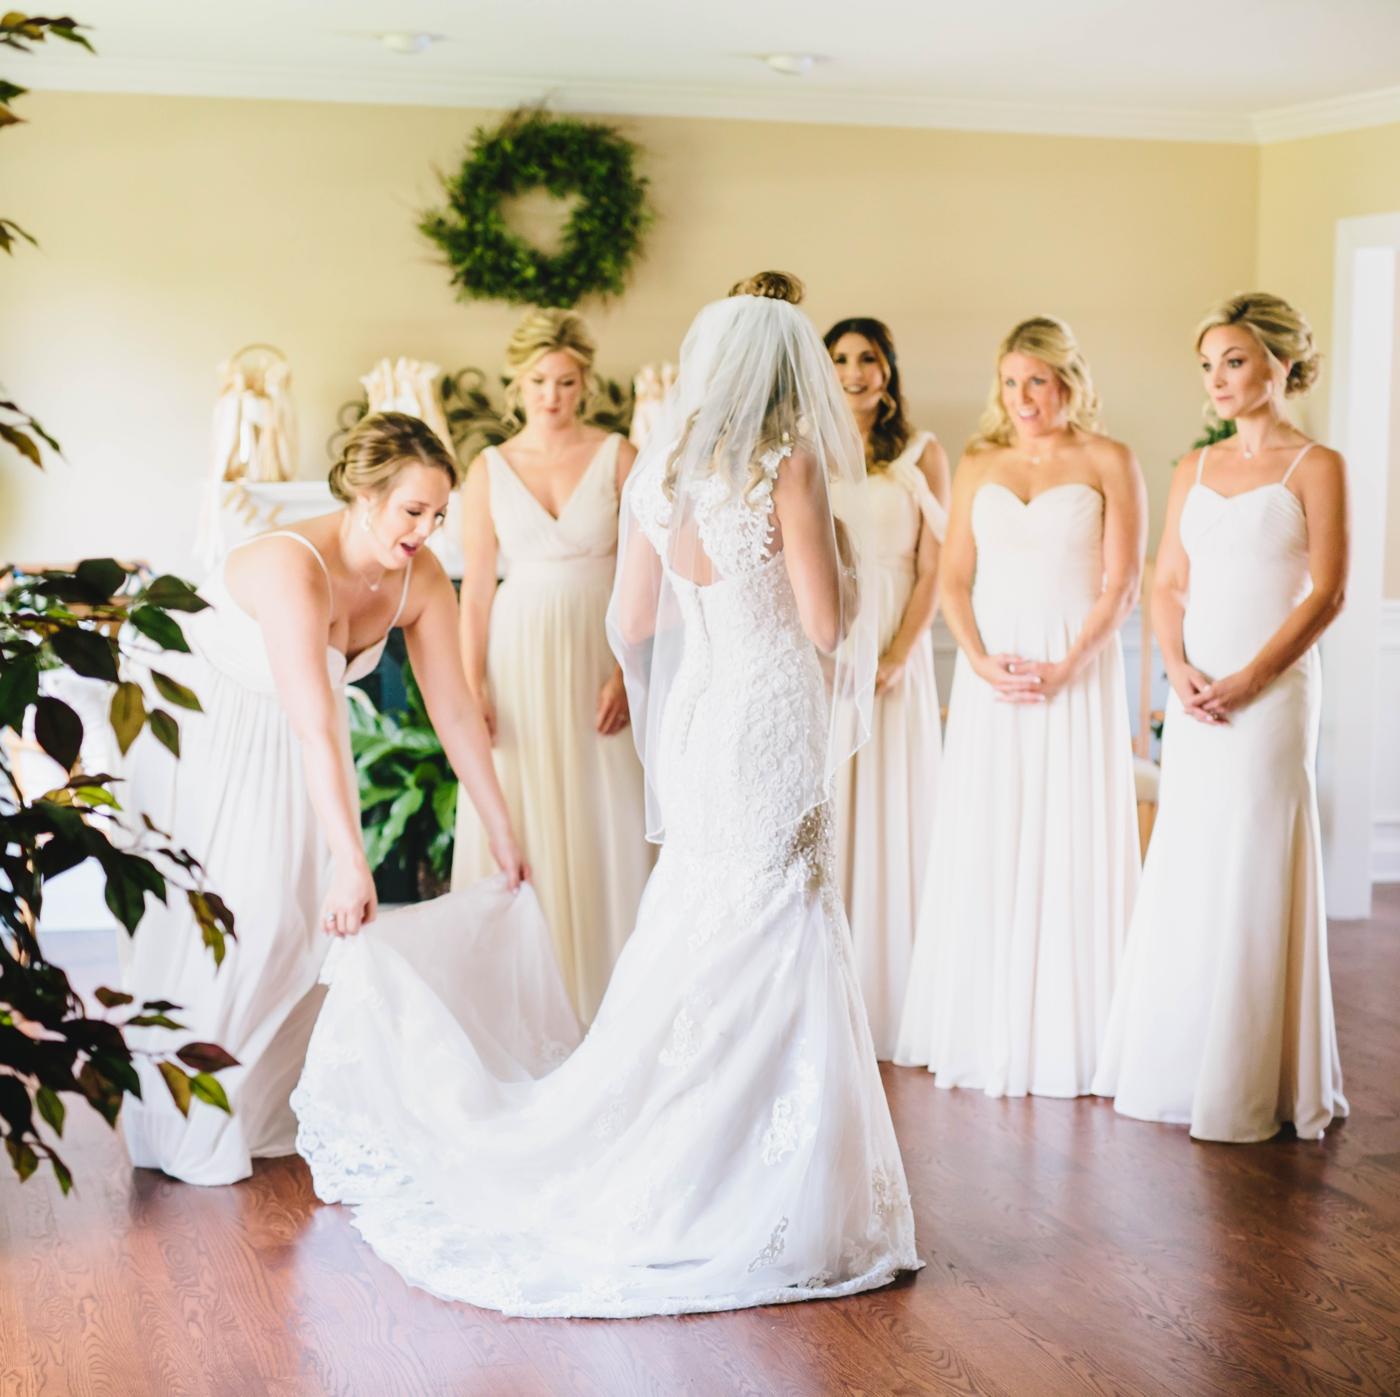 chicago-fine-art-wedding-photography-patano9